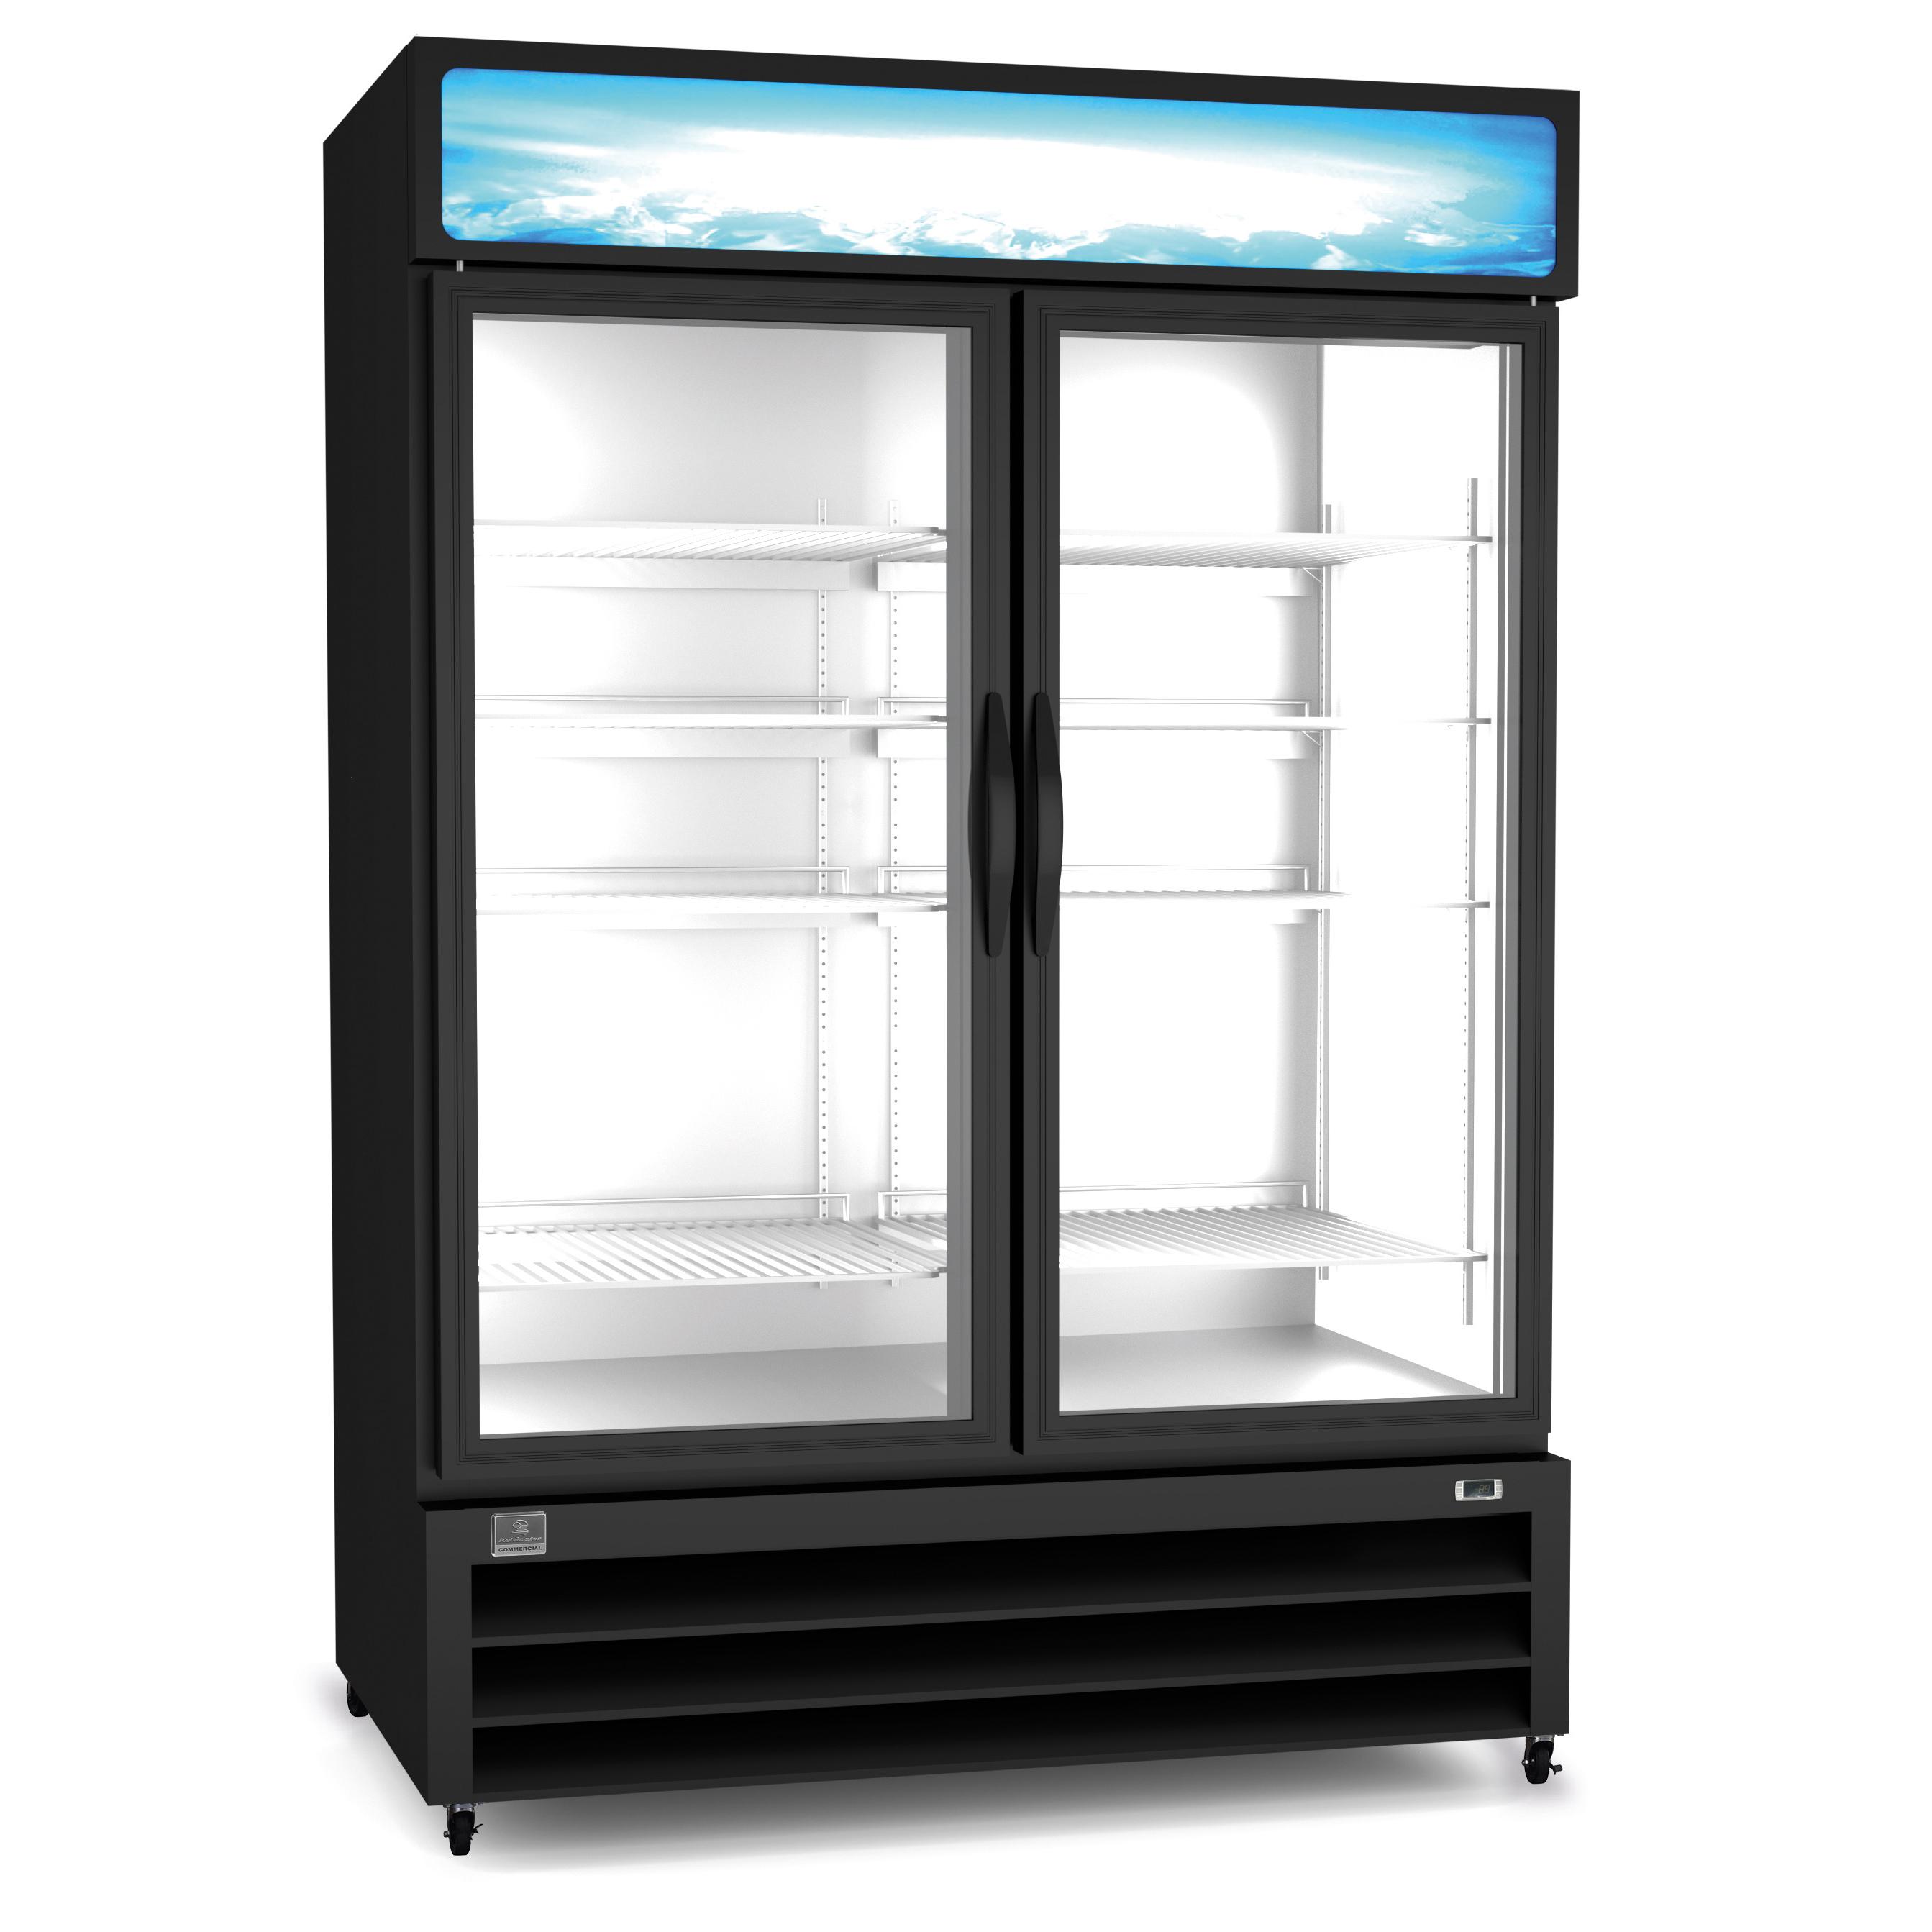 Kelvinator Commercial KCHGM48F freezer, merchandiser